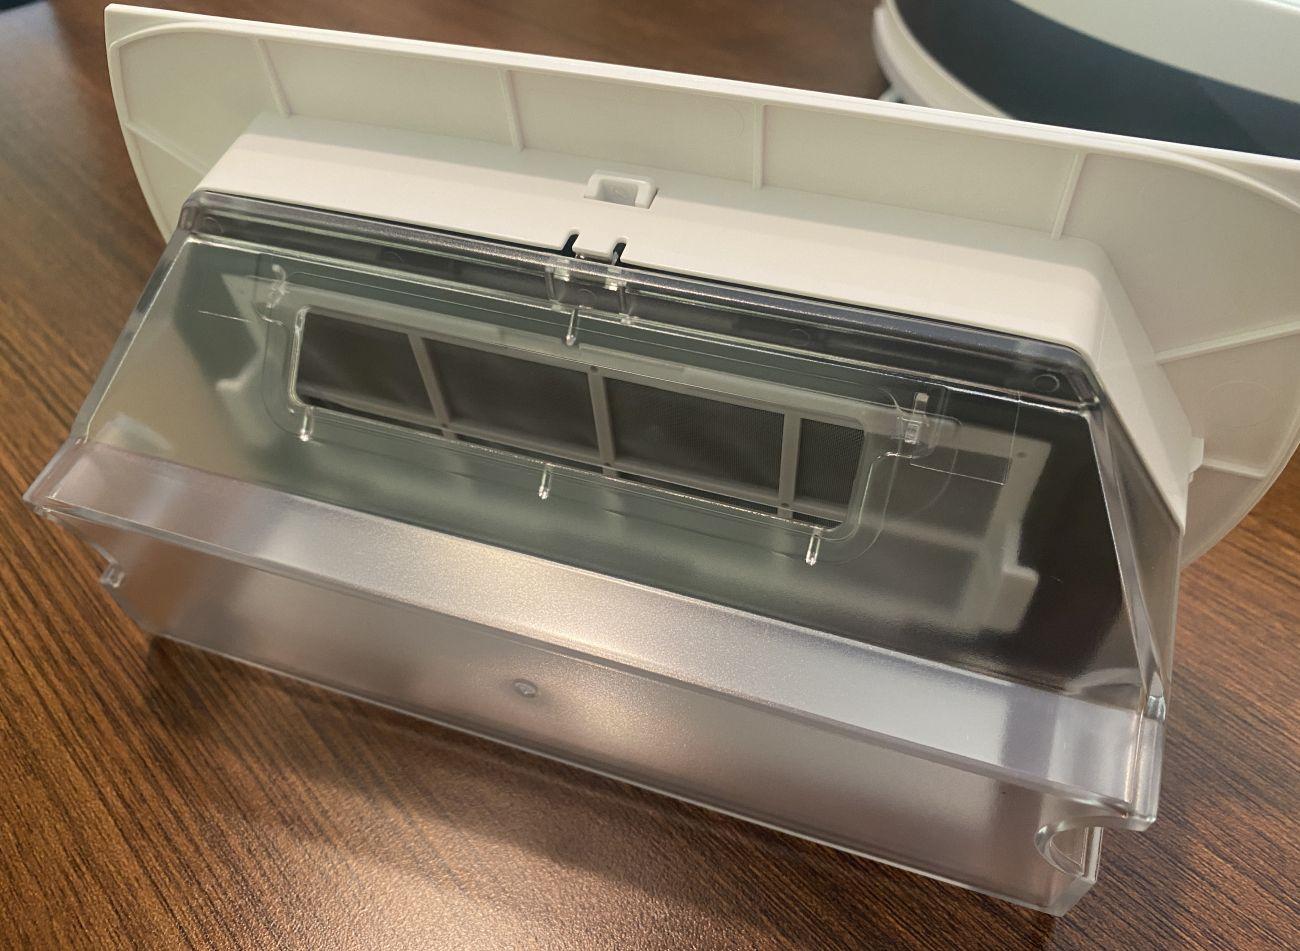 Tefal X-plorer Serie 75 RG7687 pojemnik na śmieci